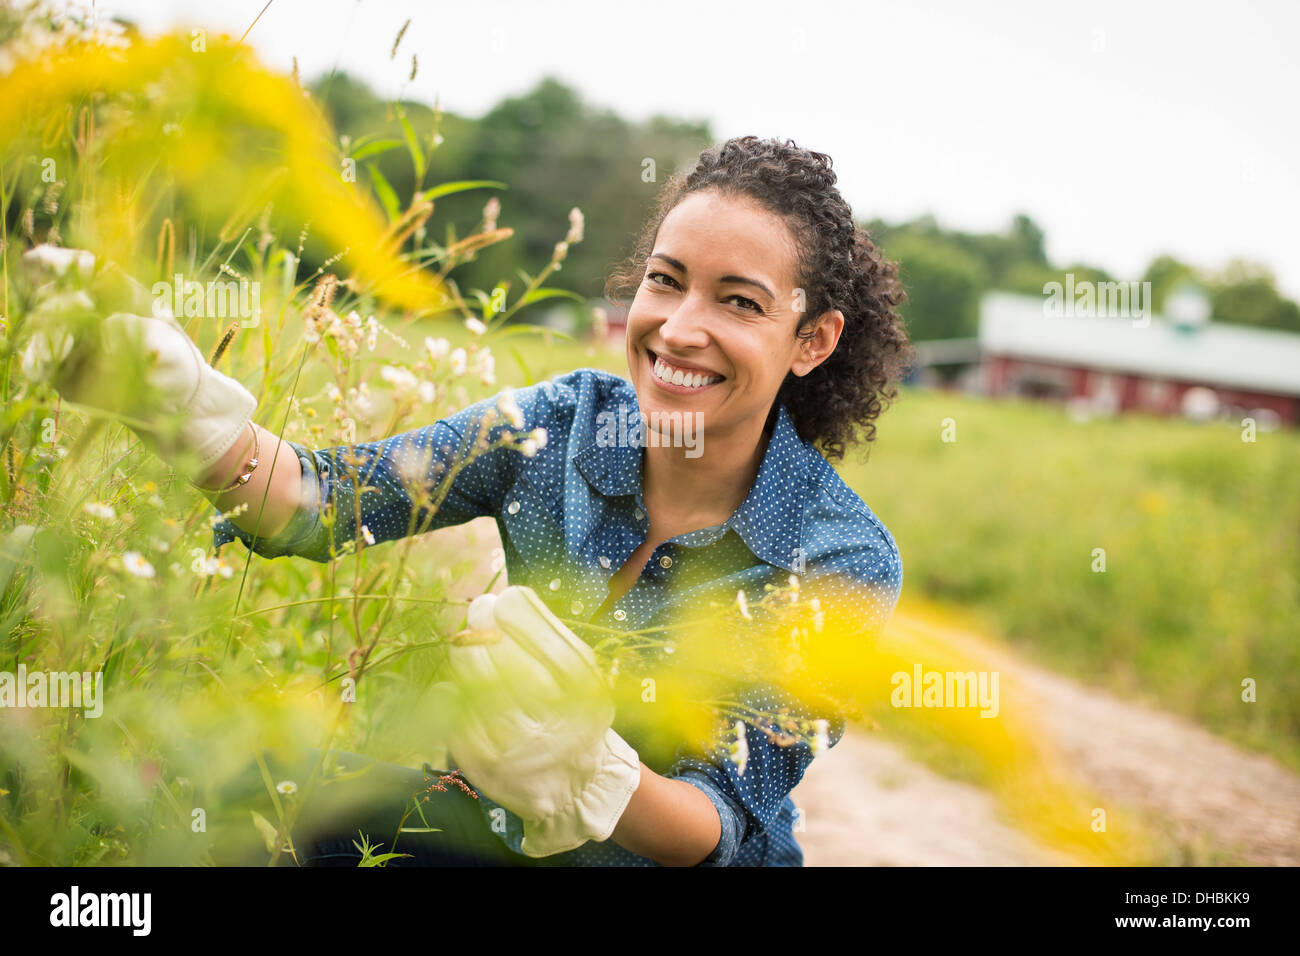 Woman working on an organic farm. Wearing gloves Admiring tall flowering plants. Stock Photo